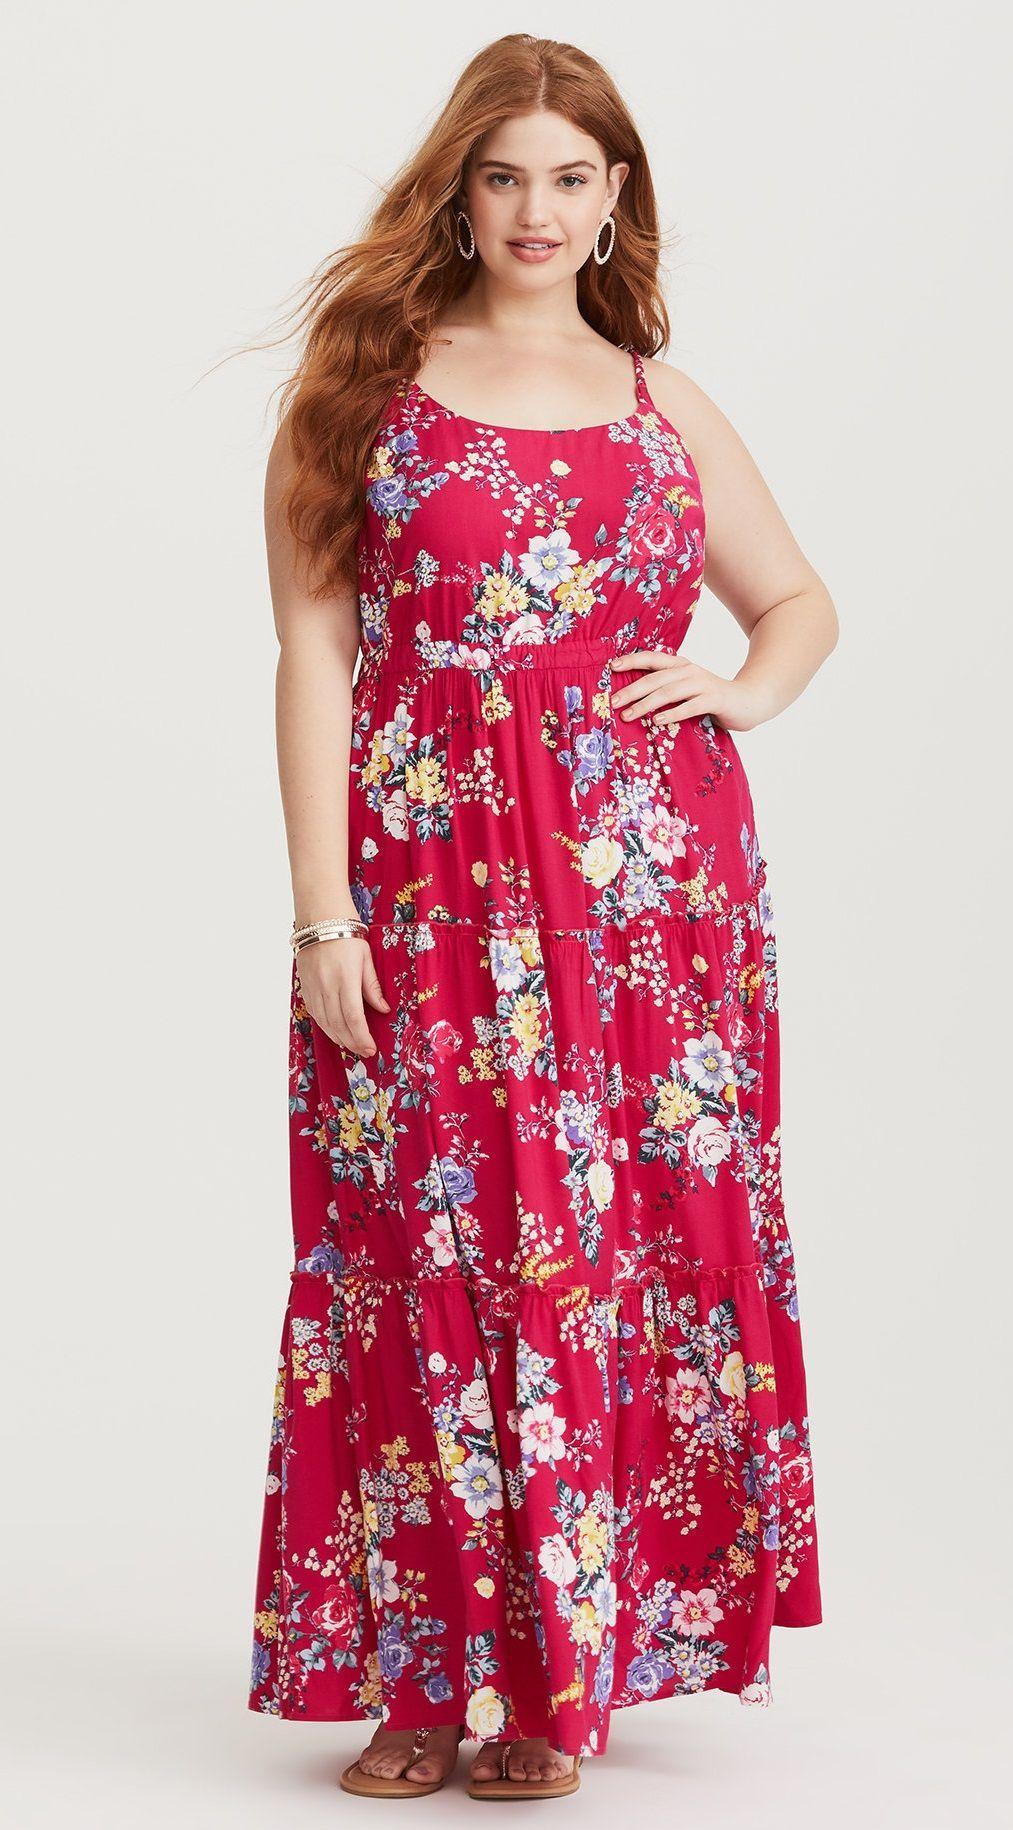 57ed2b68c4 Plus Size Maxi Dress - Plus Size Fashion for Women  plussize